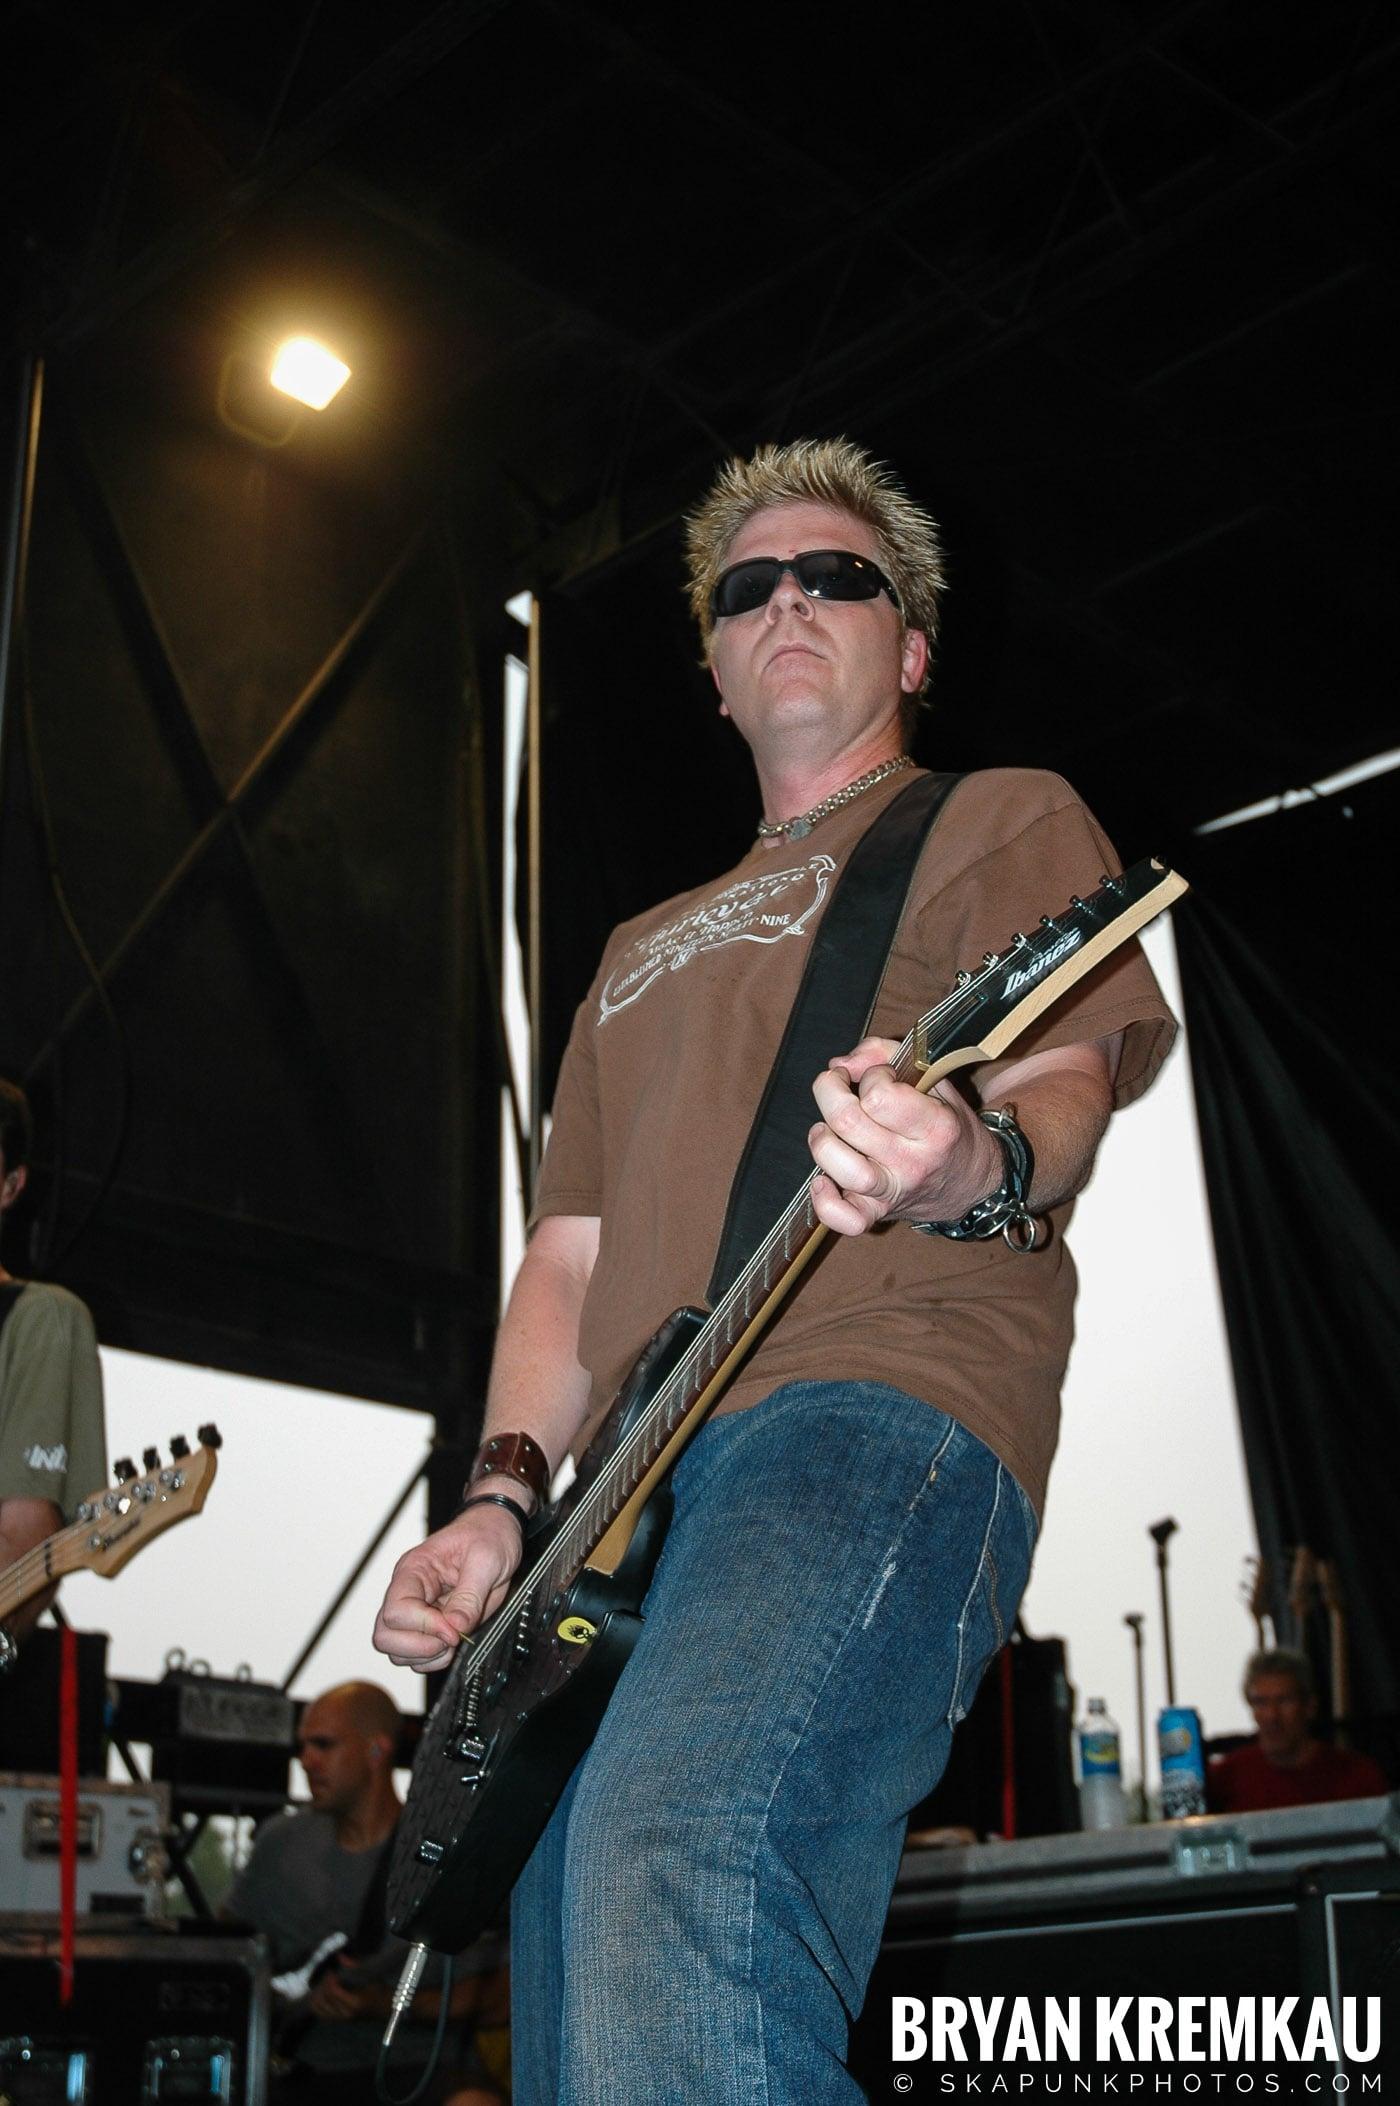 The Offspring @ Warped Tour 05, NYC - 8.12.05 (10)